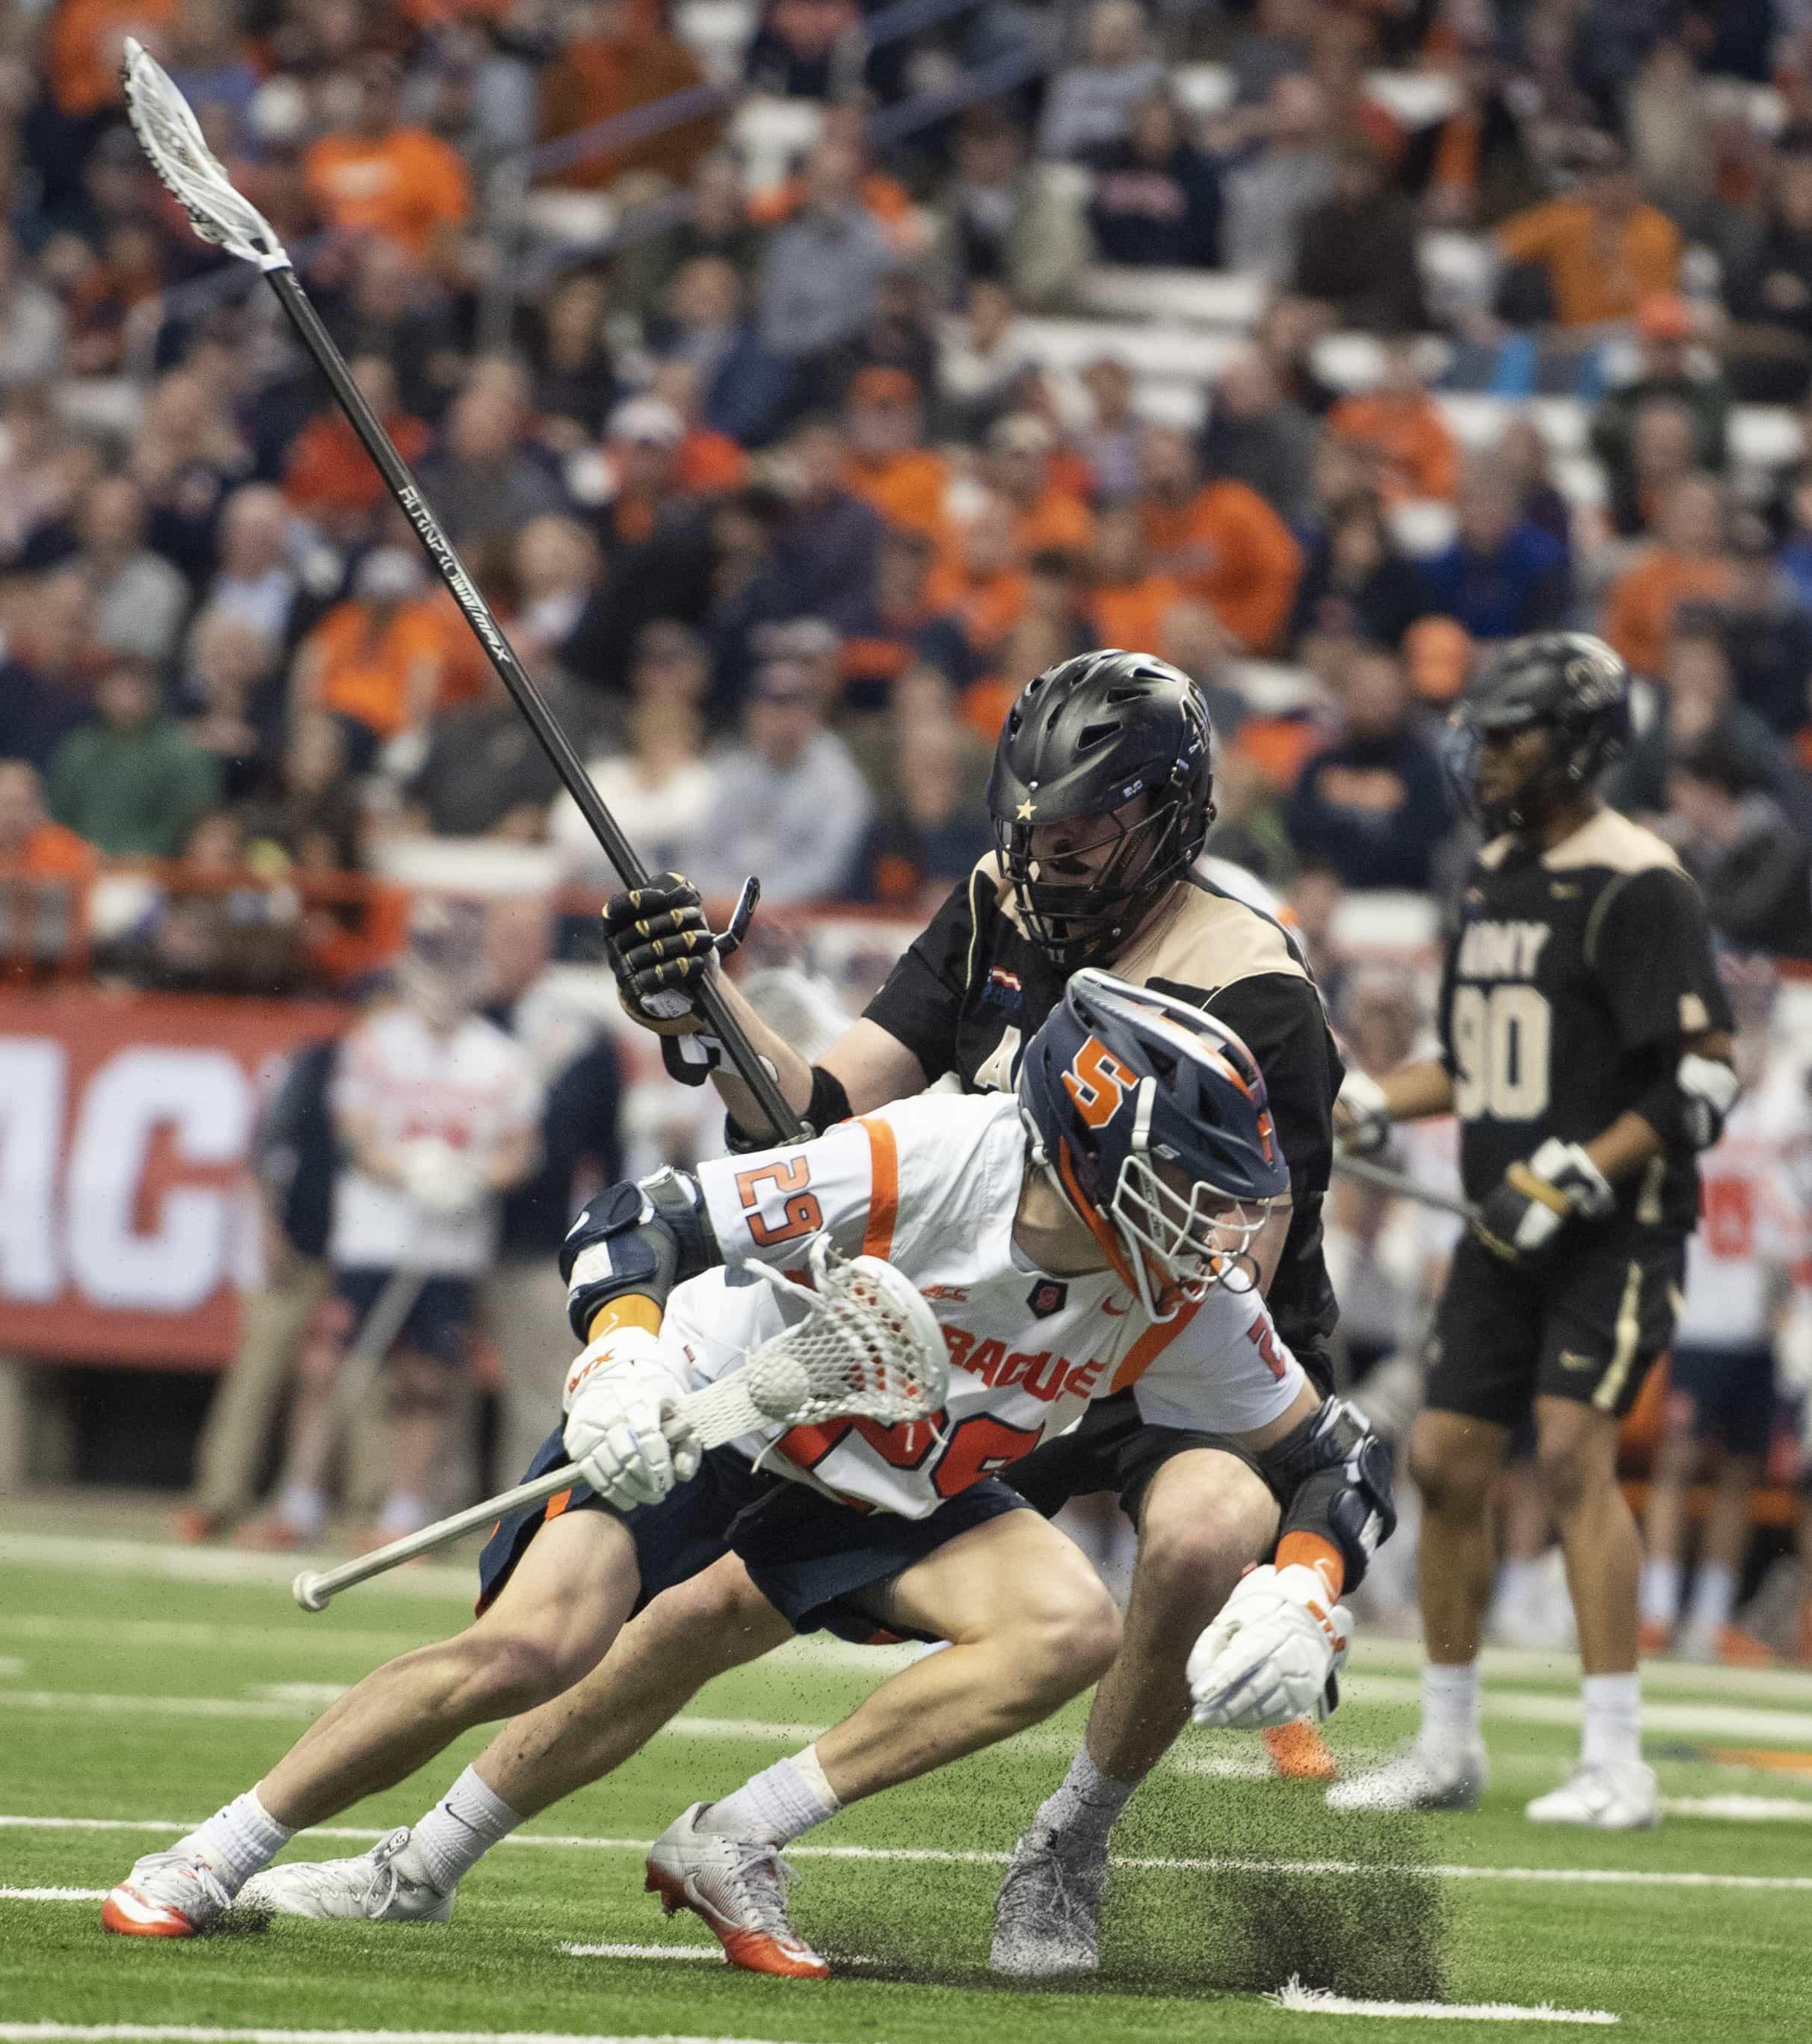 Syracuse beats Army 10-8